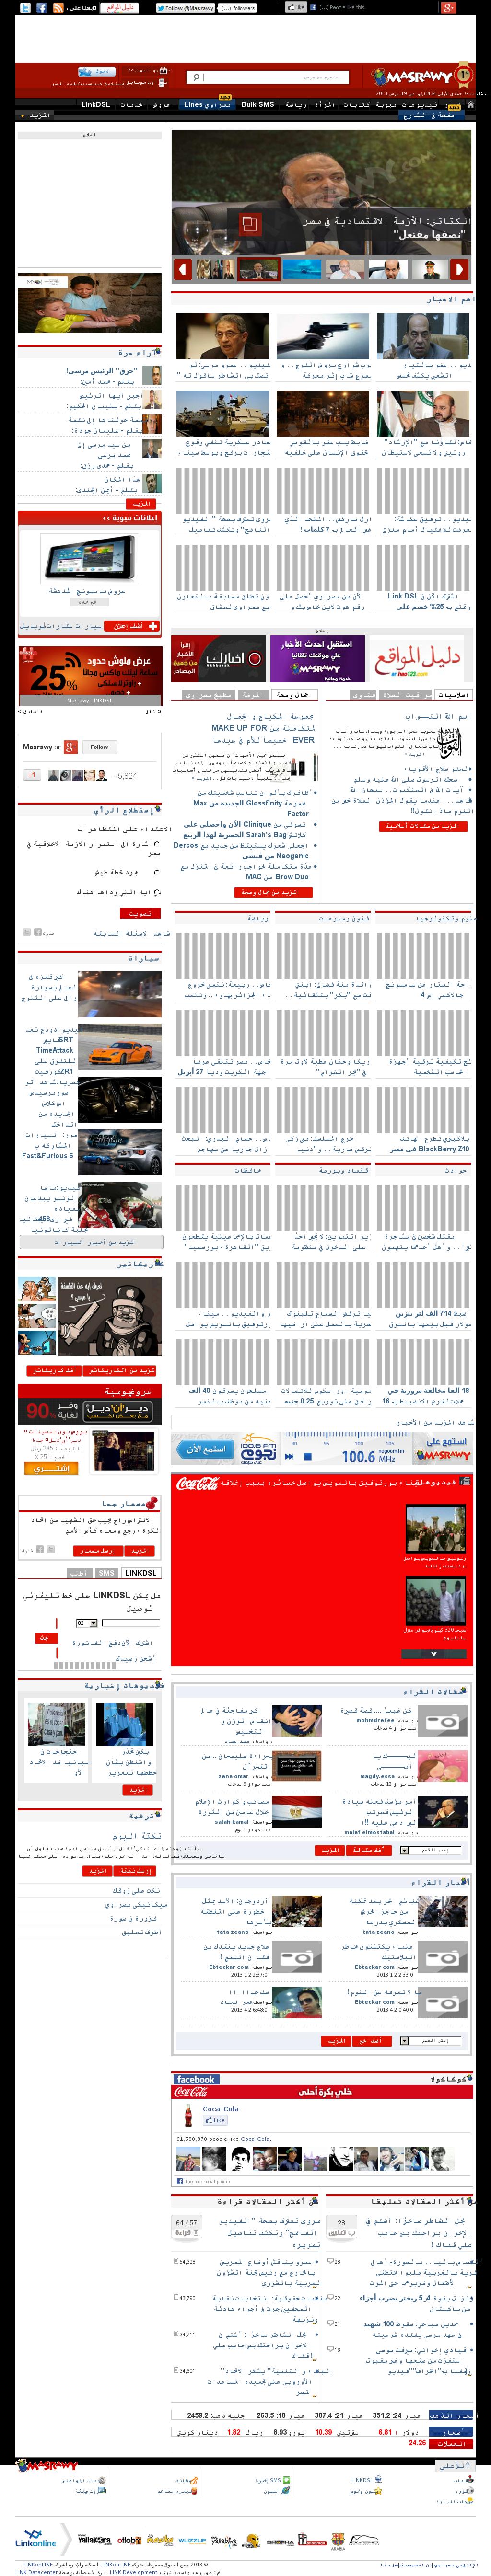 Masrawy at Tuesday March 19, 2013, 10:15 a.m. UTC